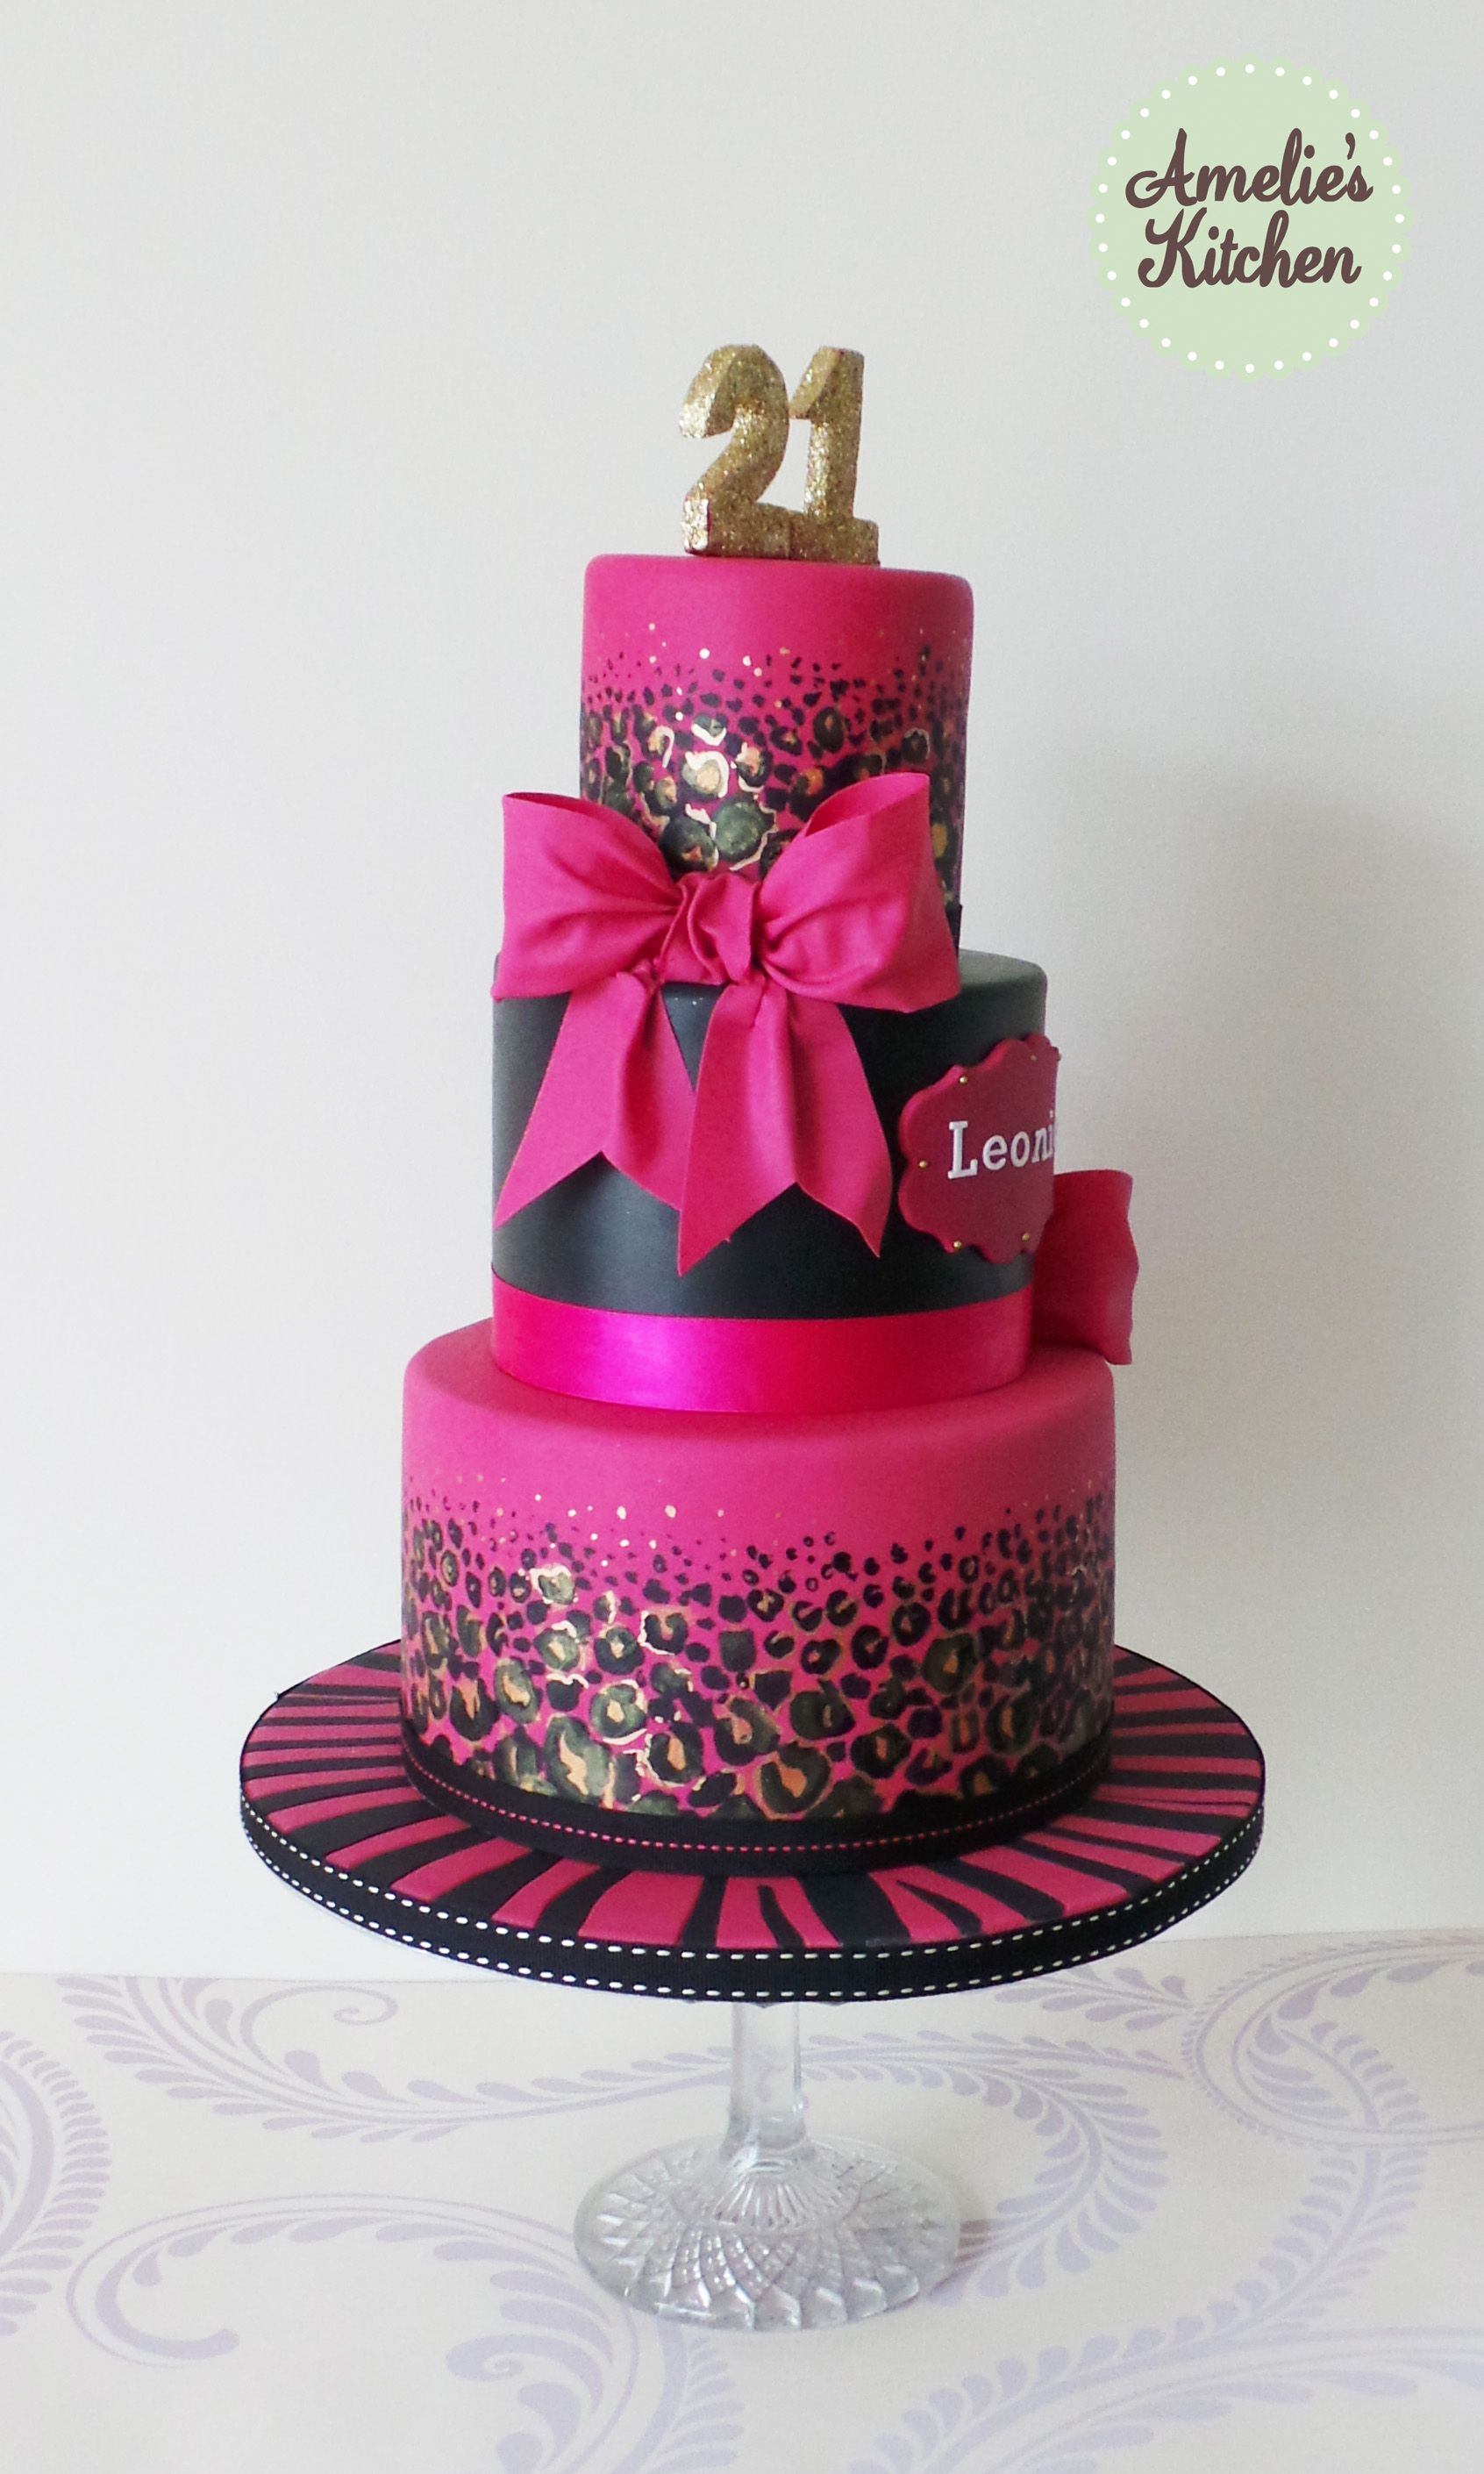 Birthday Cakes   Cake Fabric imitation   Pinterest   Birthday cakes ...